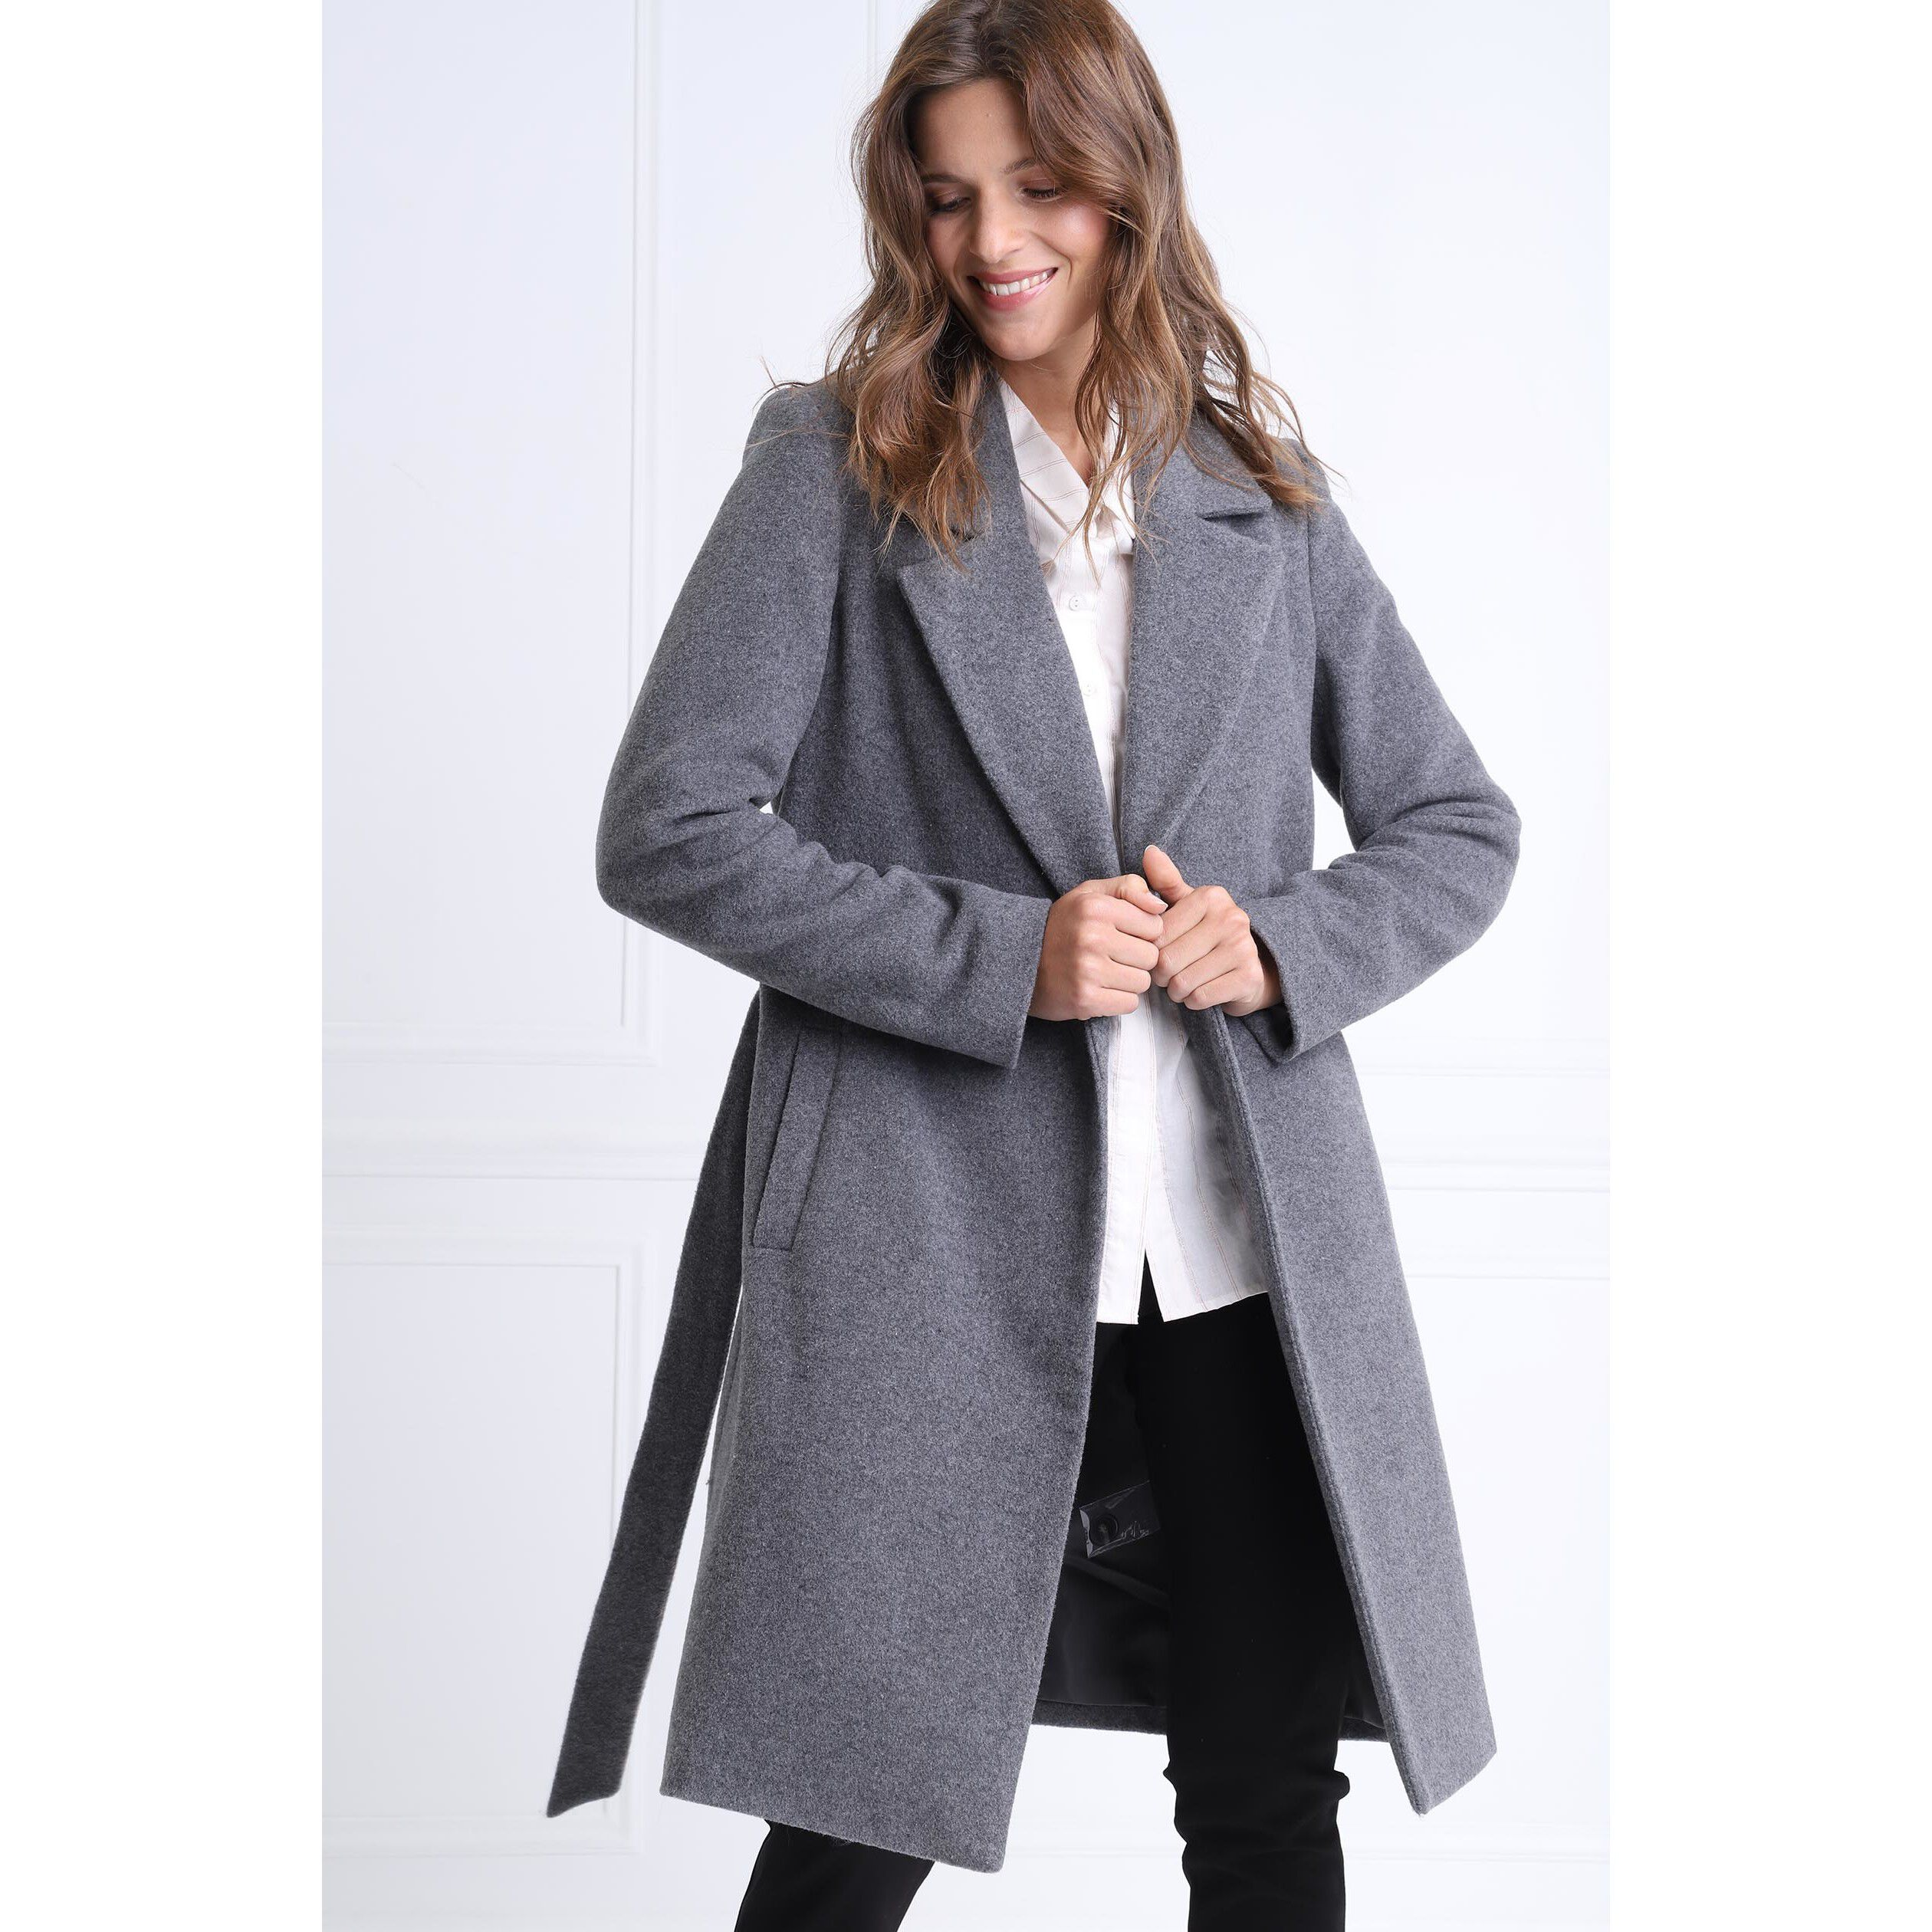 Manteau Manteau femmeBréal en Manteau solde en solde femmeBréal femmeBréal en Manteau solde en W92DIHEY